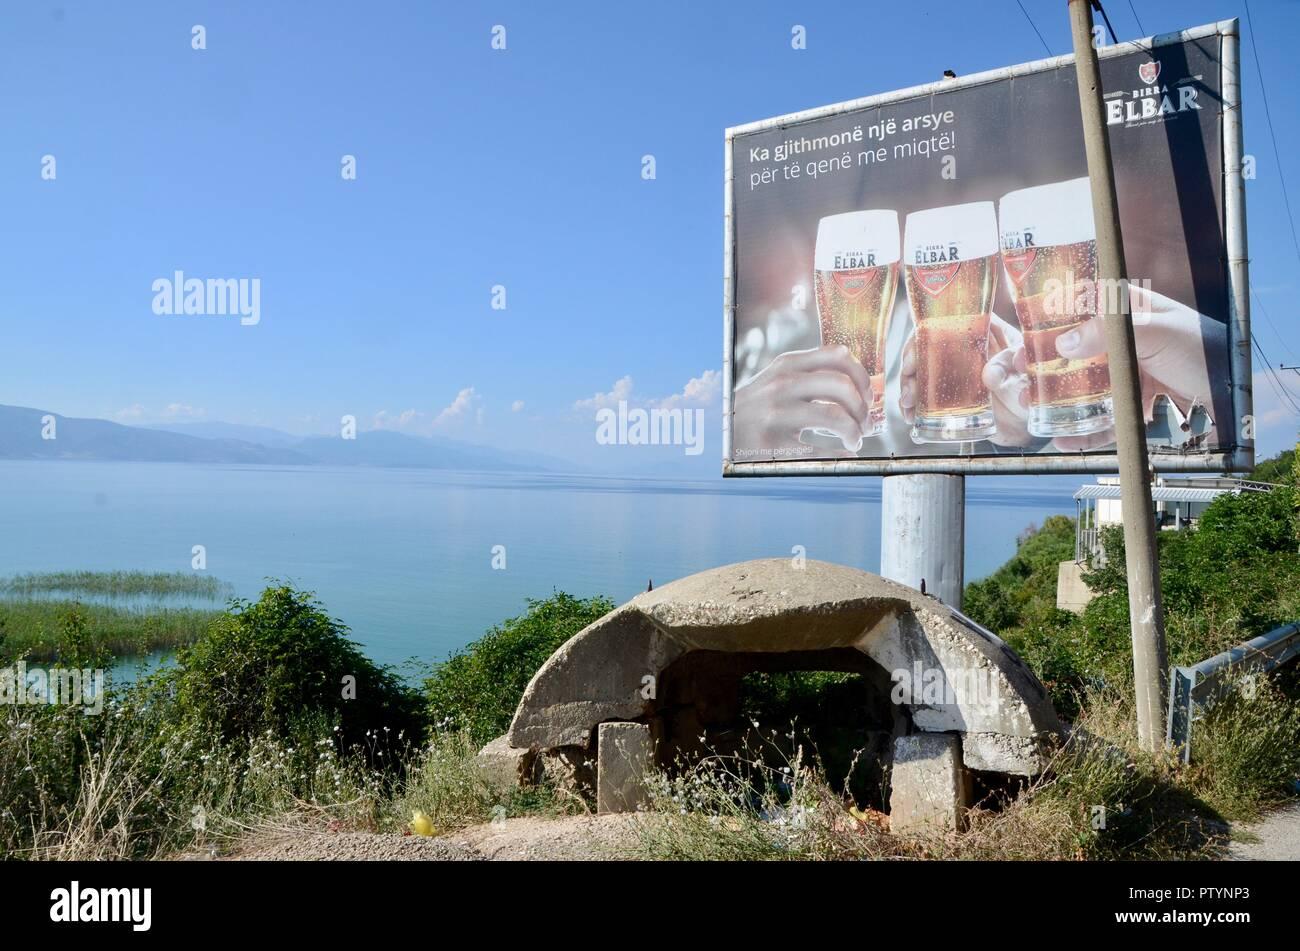 beer advert billboard and concrete bunker near Pogradec albania - Stock Image